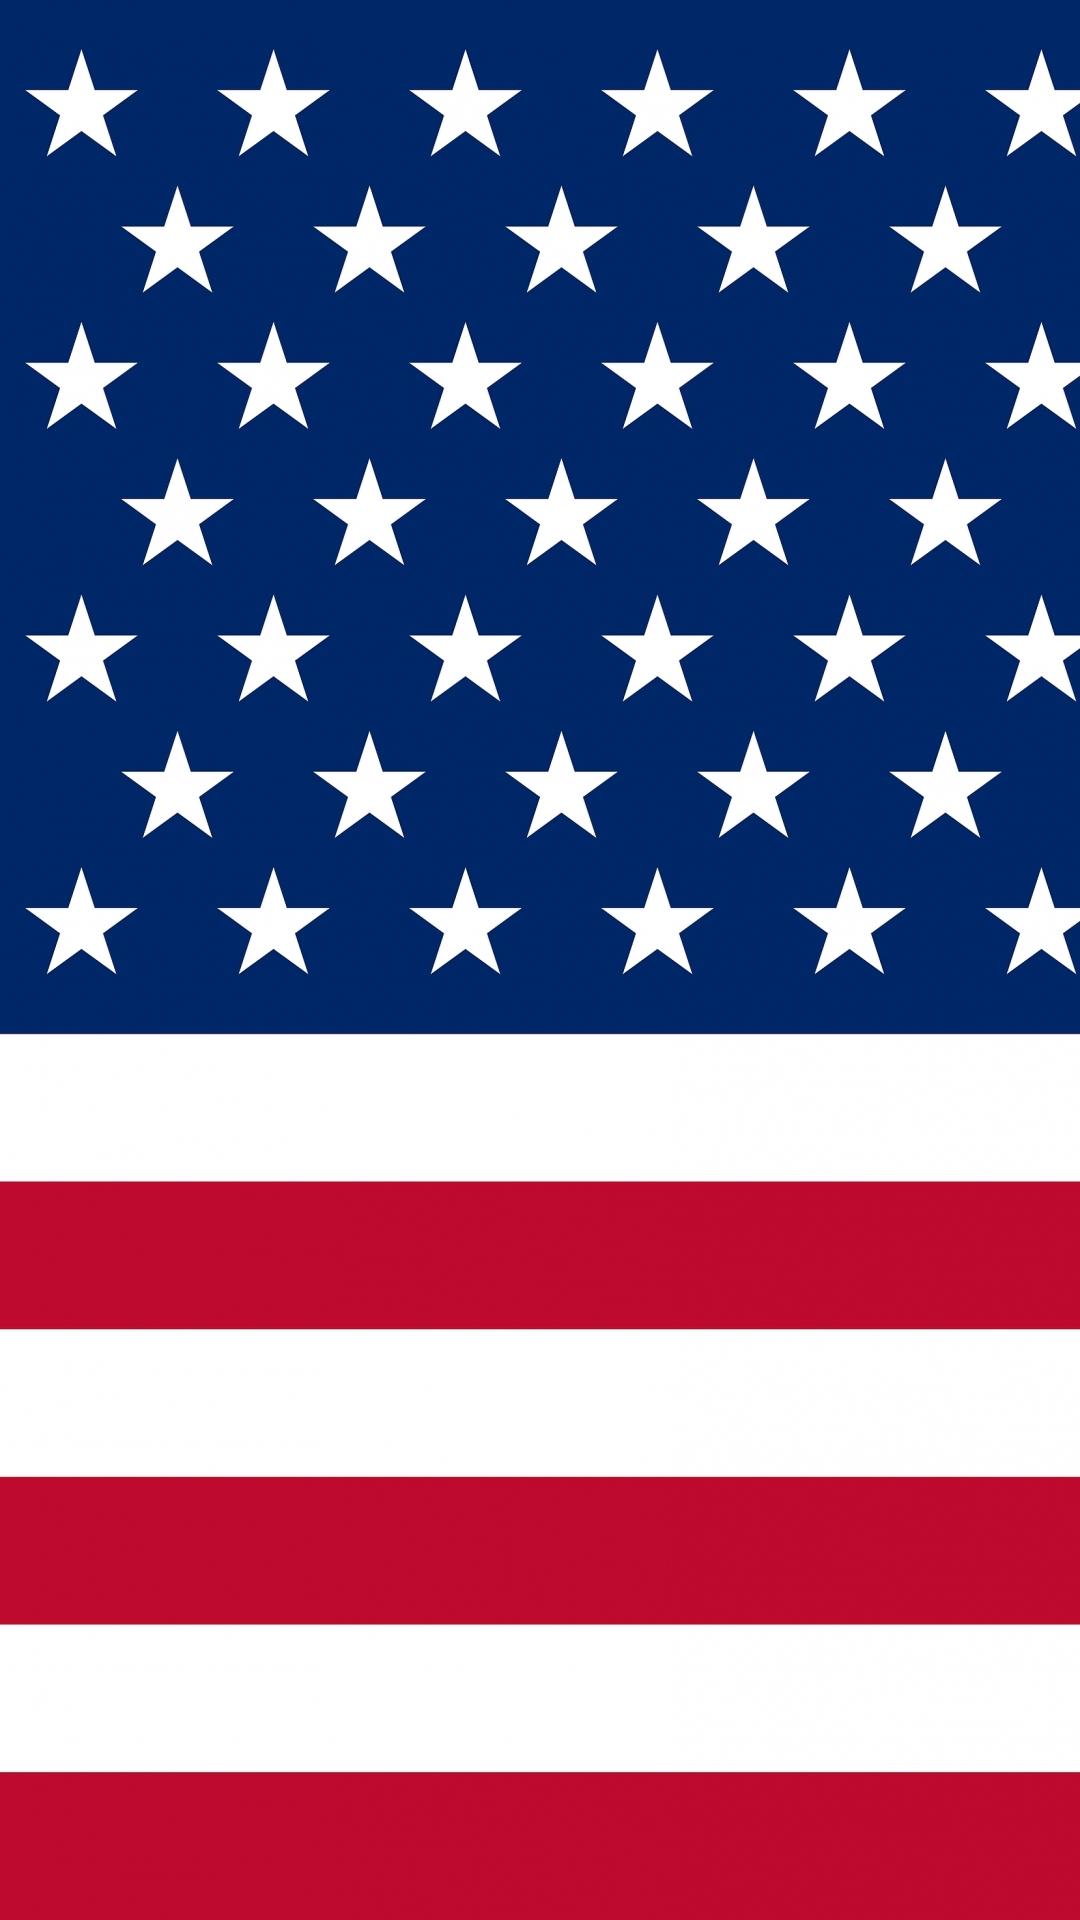 Chevron Iphone 5 Wallpaper American Flag Hd Iphone Wallpapers Pixelstalk Net